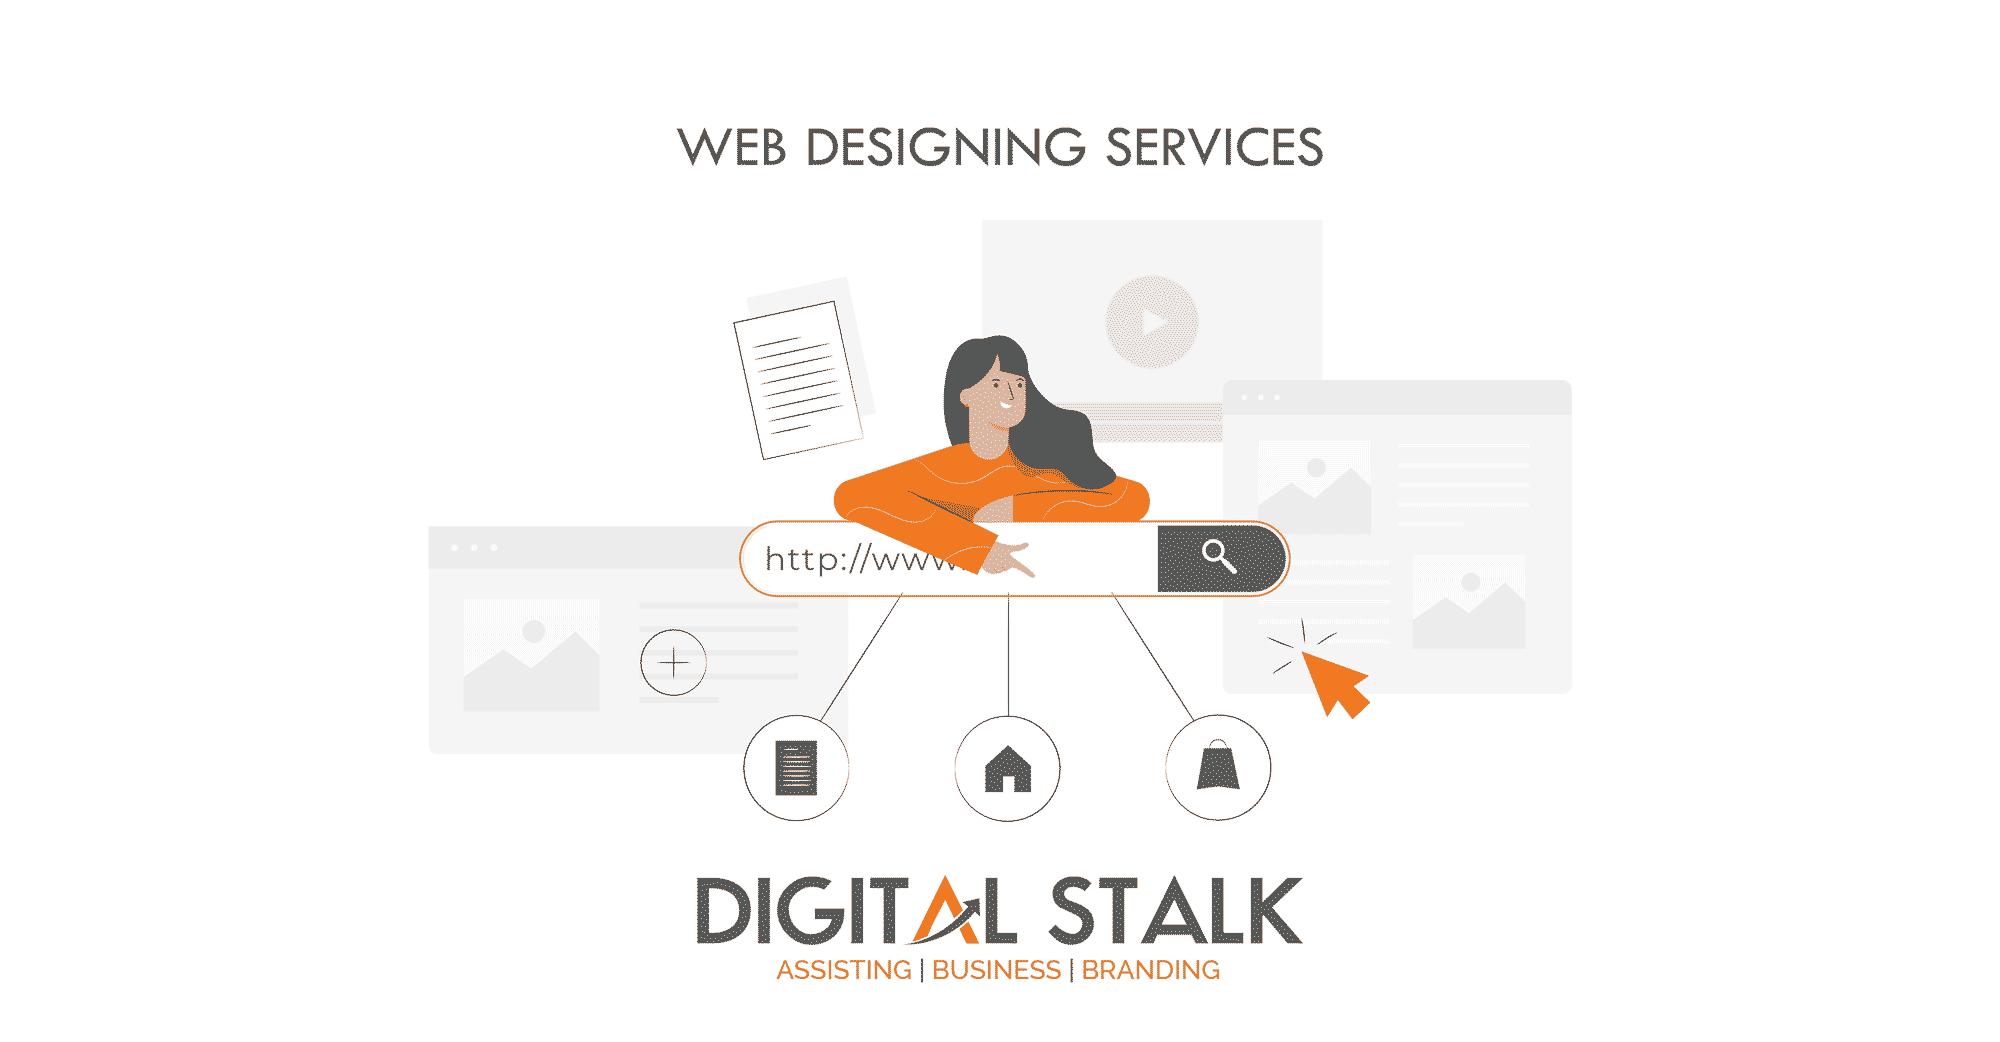 Digital Stalk Best Website Design Website Redesign Services Company In Hyderabad